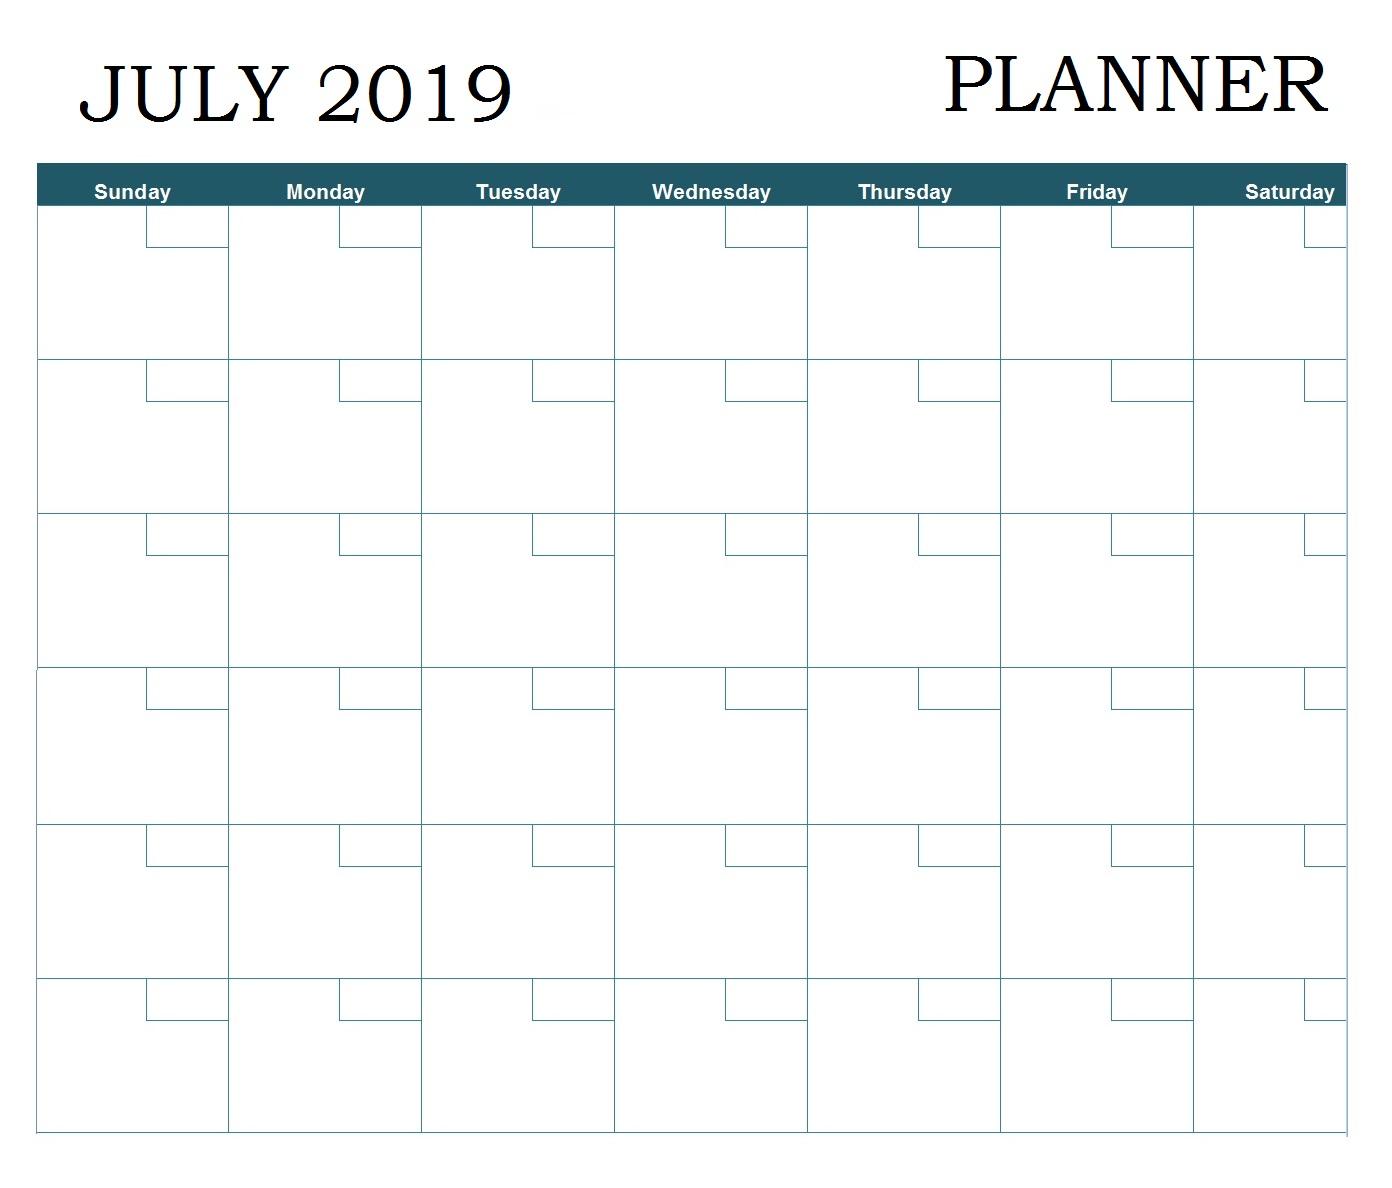 July 2019 Printable Planner